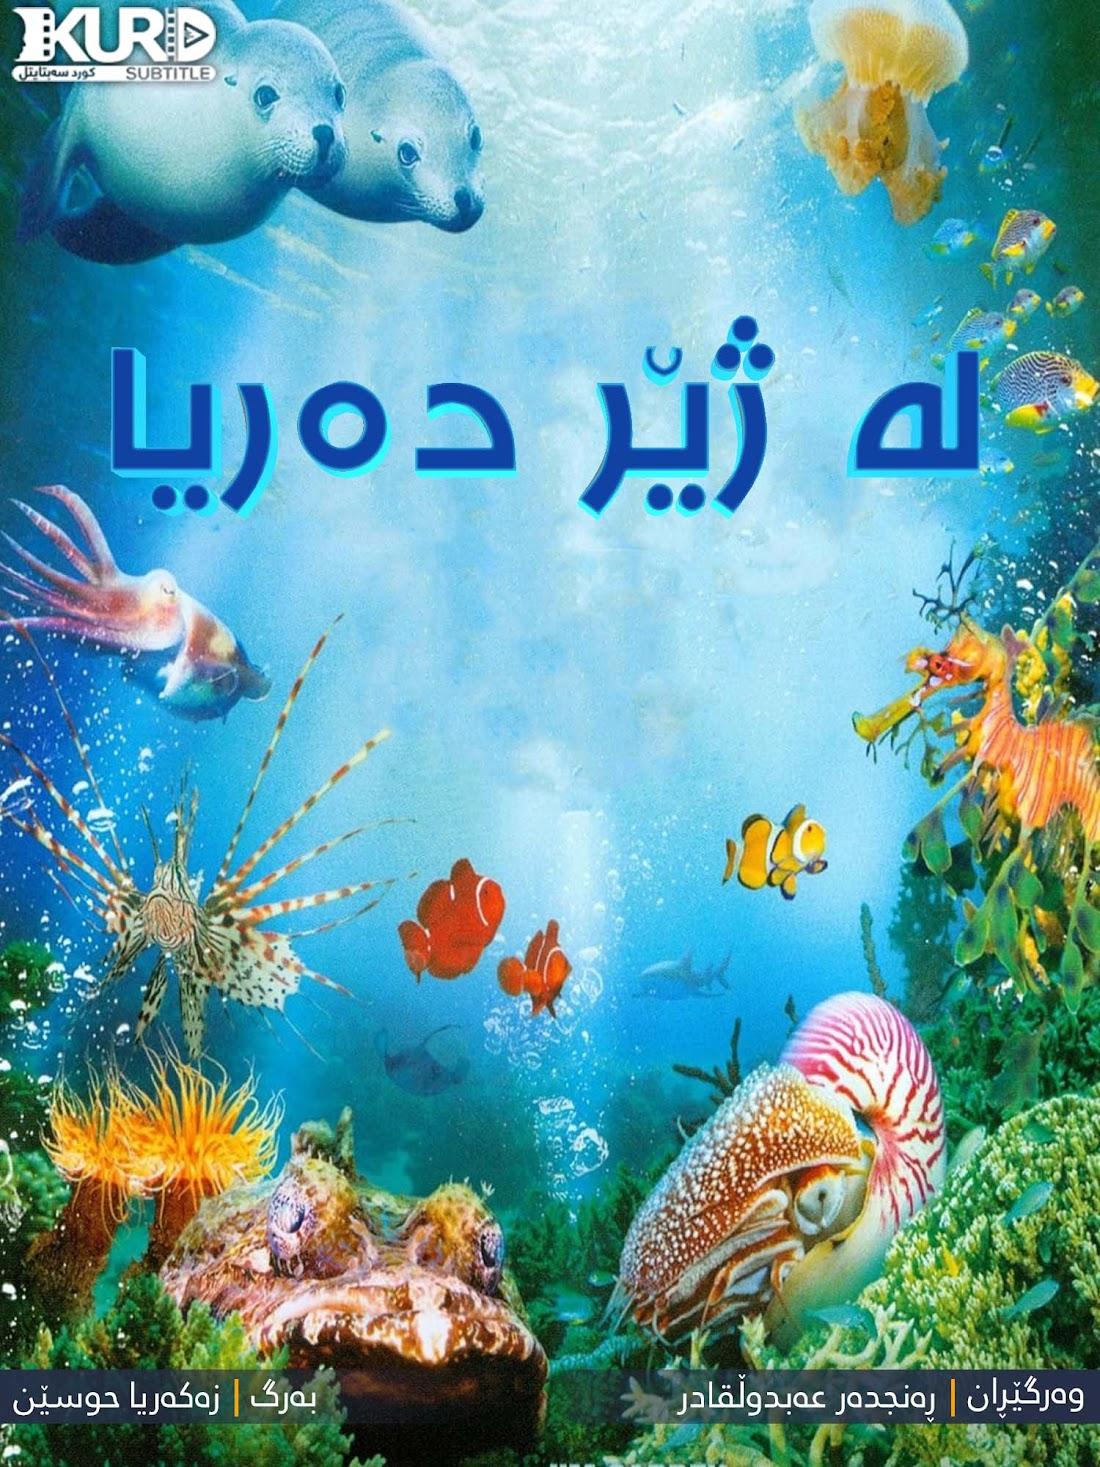 Under the Sea 3D kurdish poster